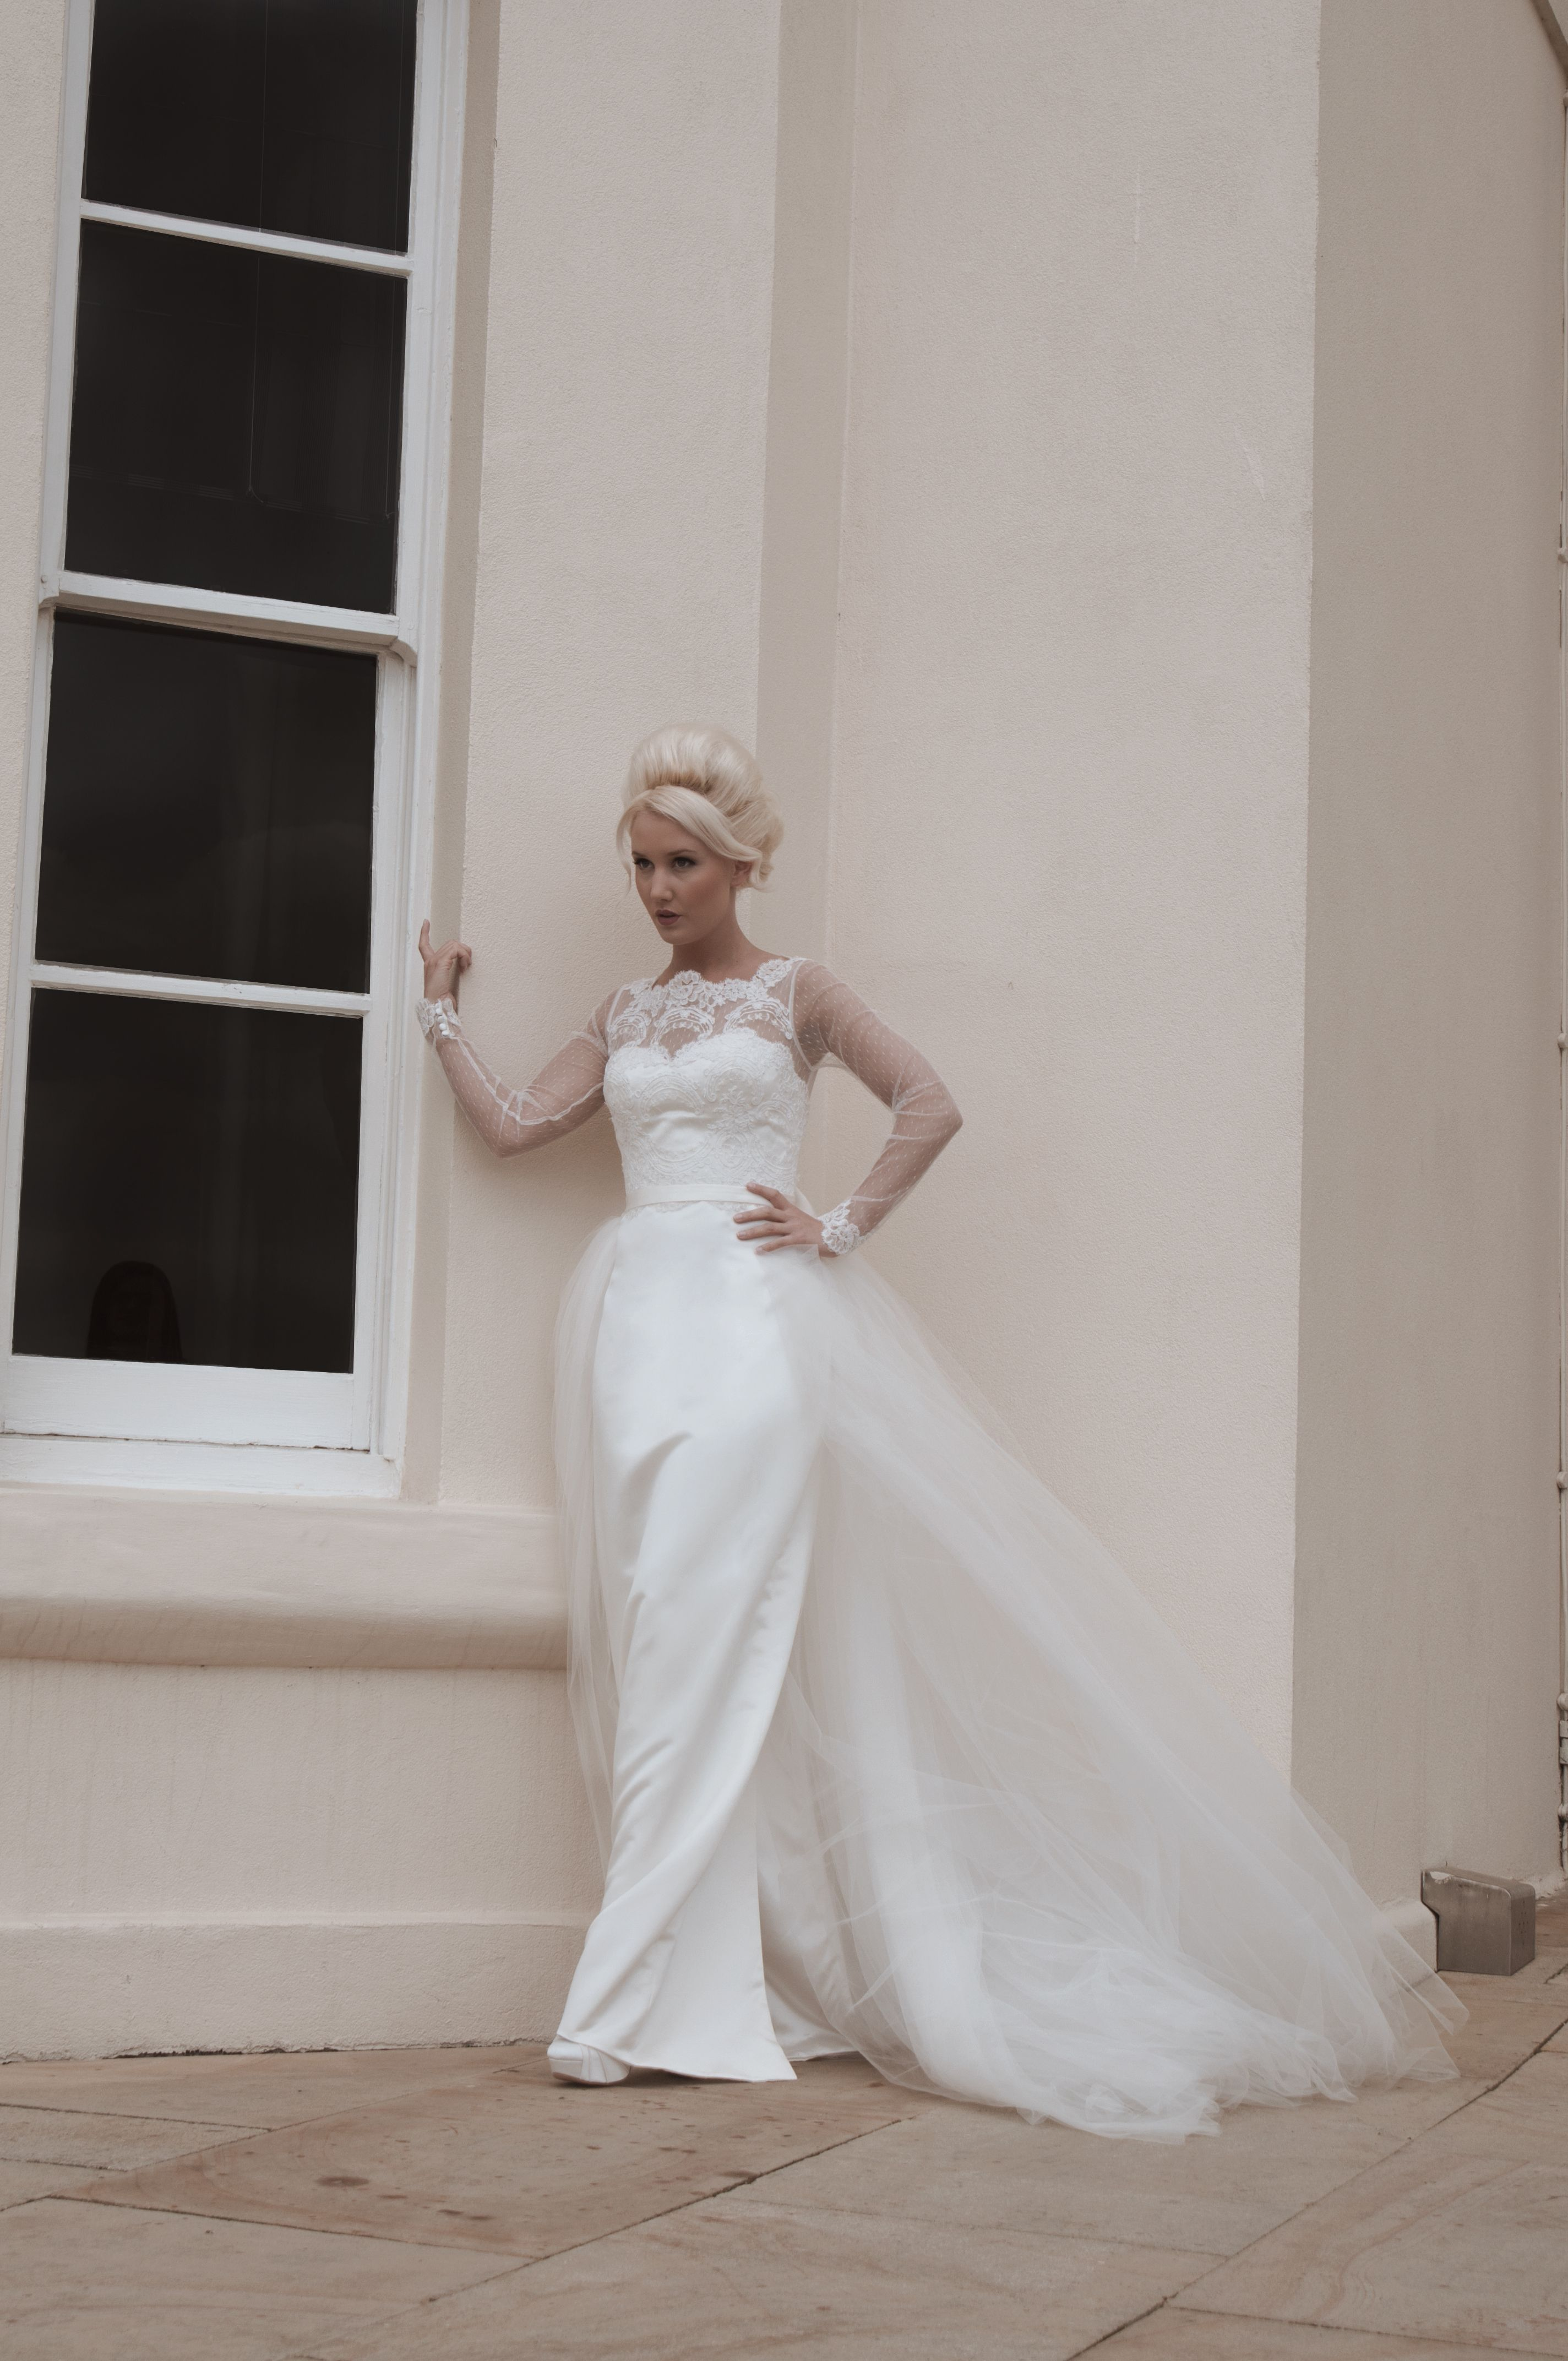 Mooshki Jane Knee Length Pencil Skirt Wedding Dress With Lace Sleeves And Detachable T Tea Length Wedding Dresses Lace Short Wedding Dress Tulle Wedding Gown [ 4288 x 2848 Pixel ]